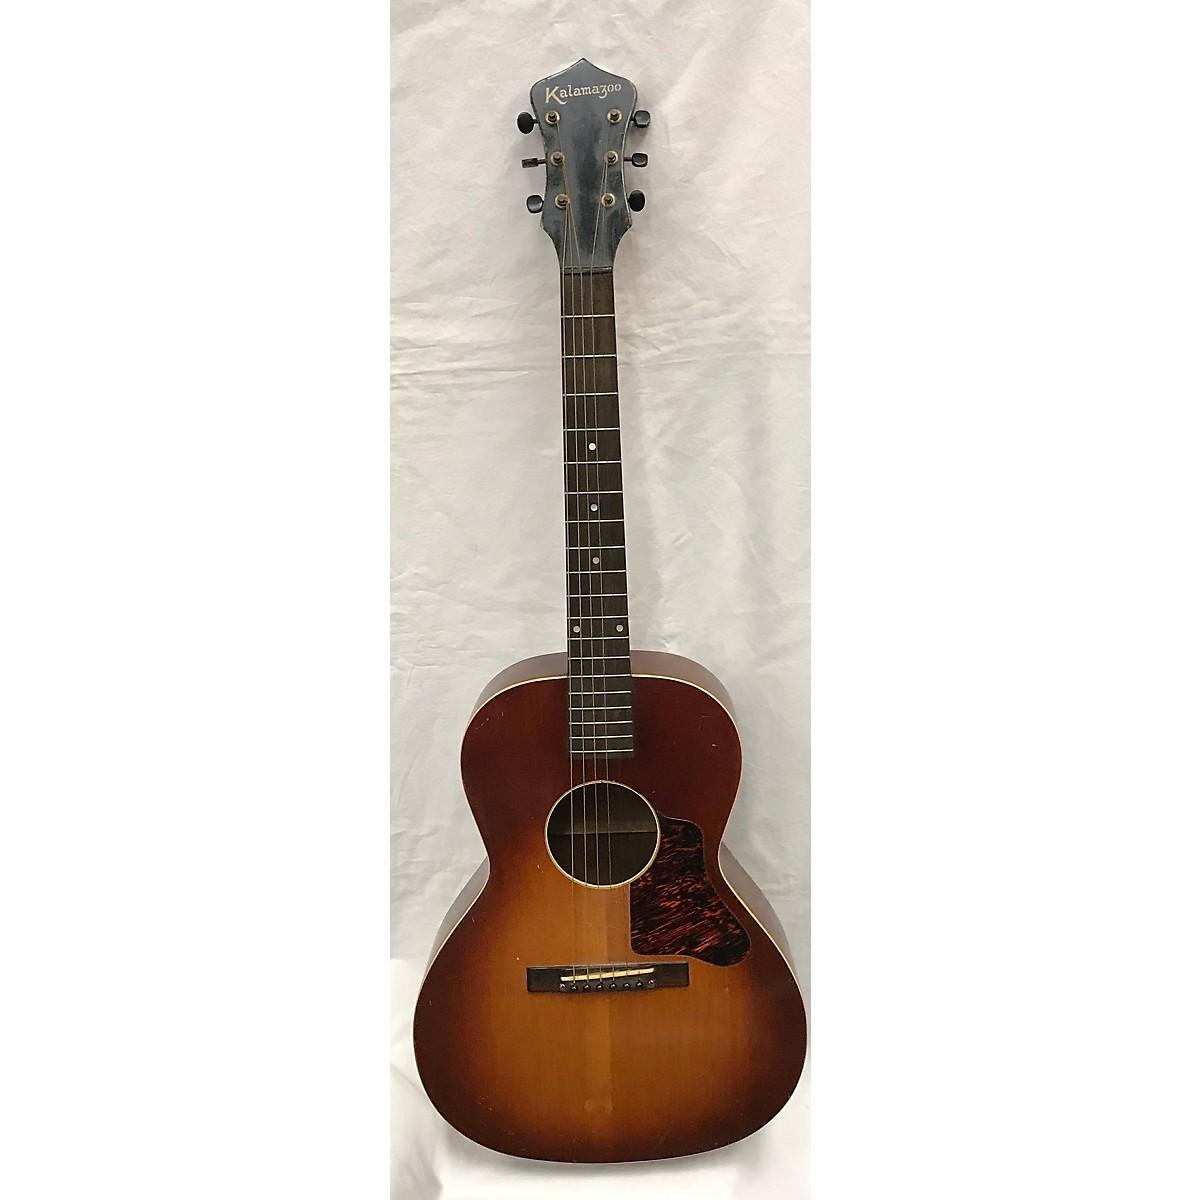 Kalamazoo 1940 KG-14 Acoustic Guitar